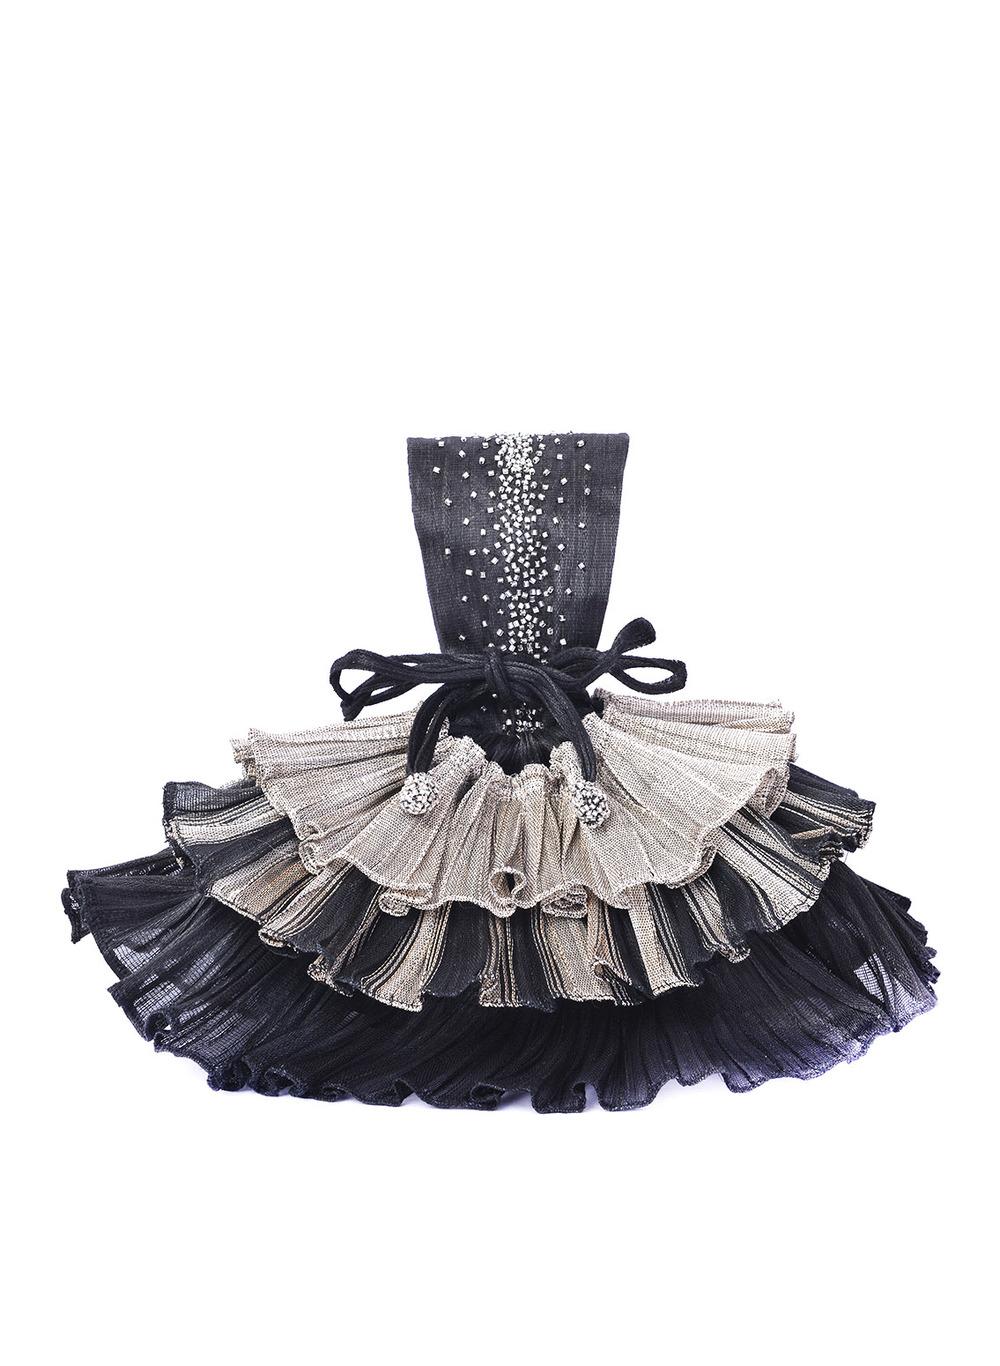 bags_serena_combi_black_stripes_silver.jpg